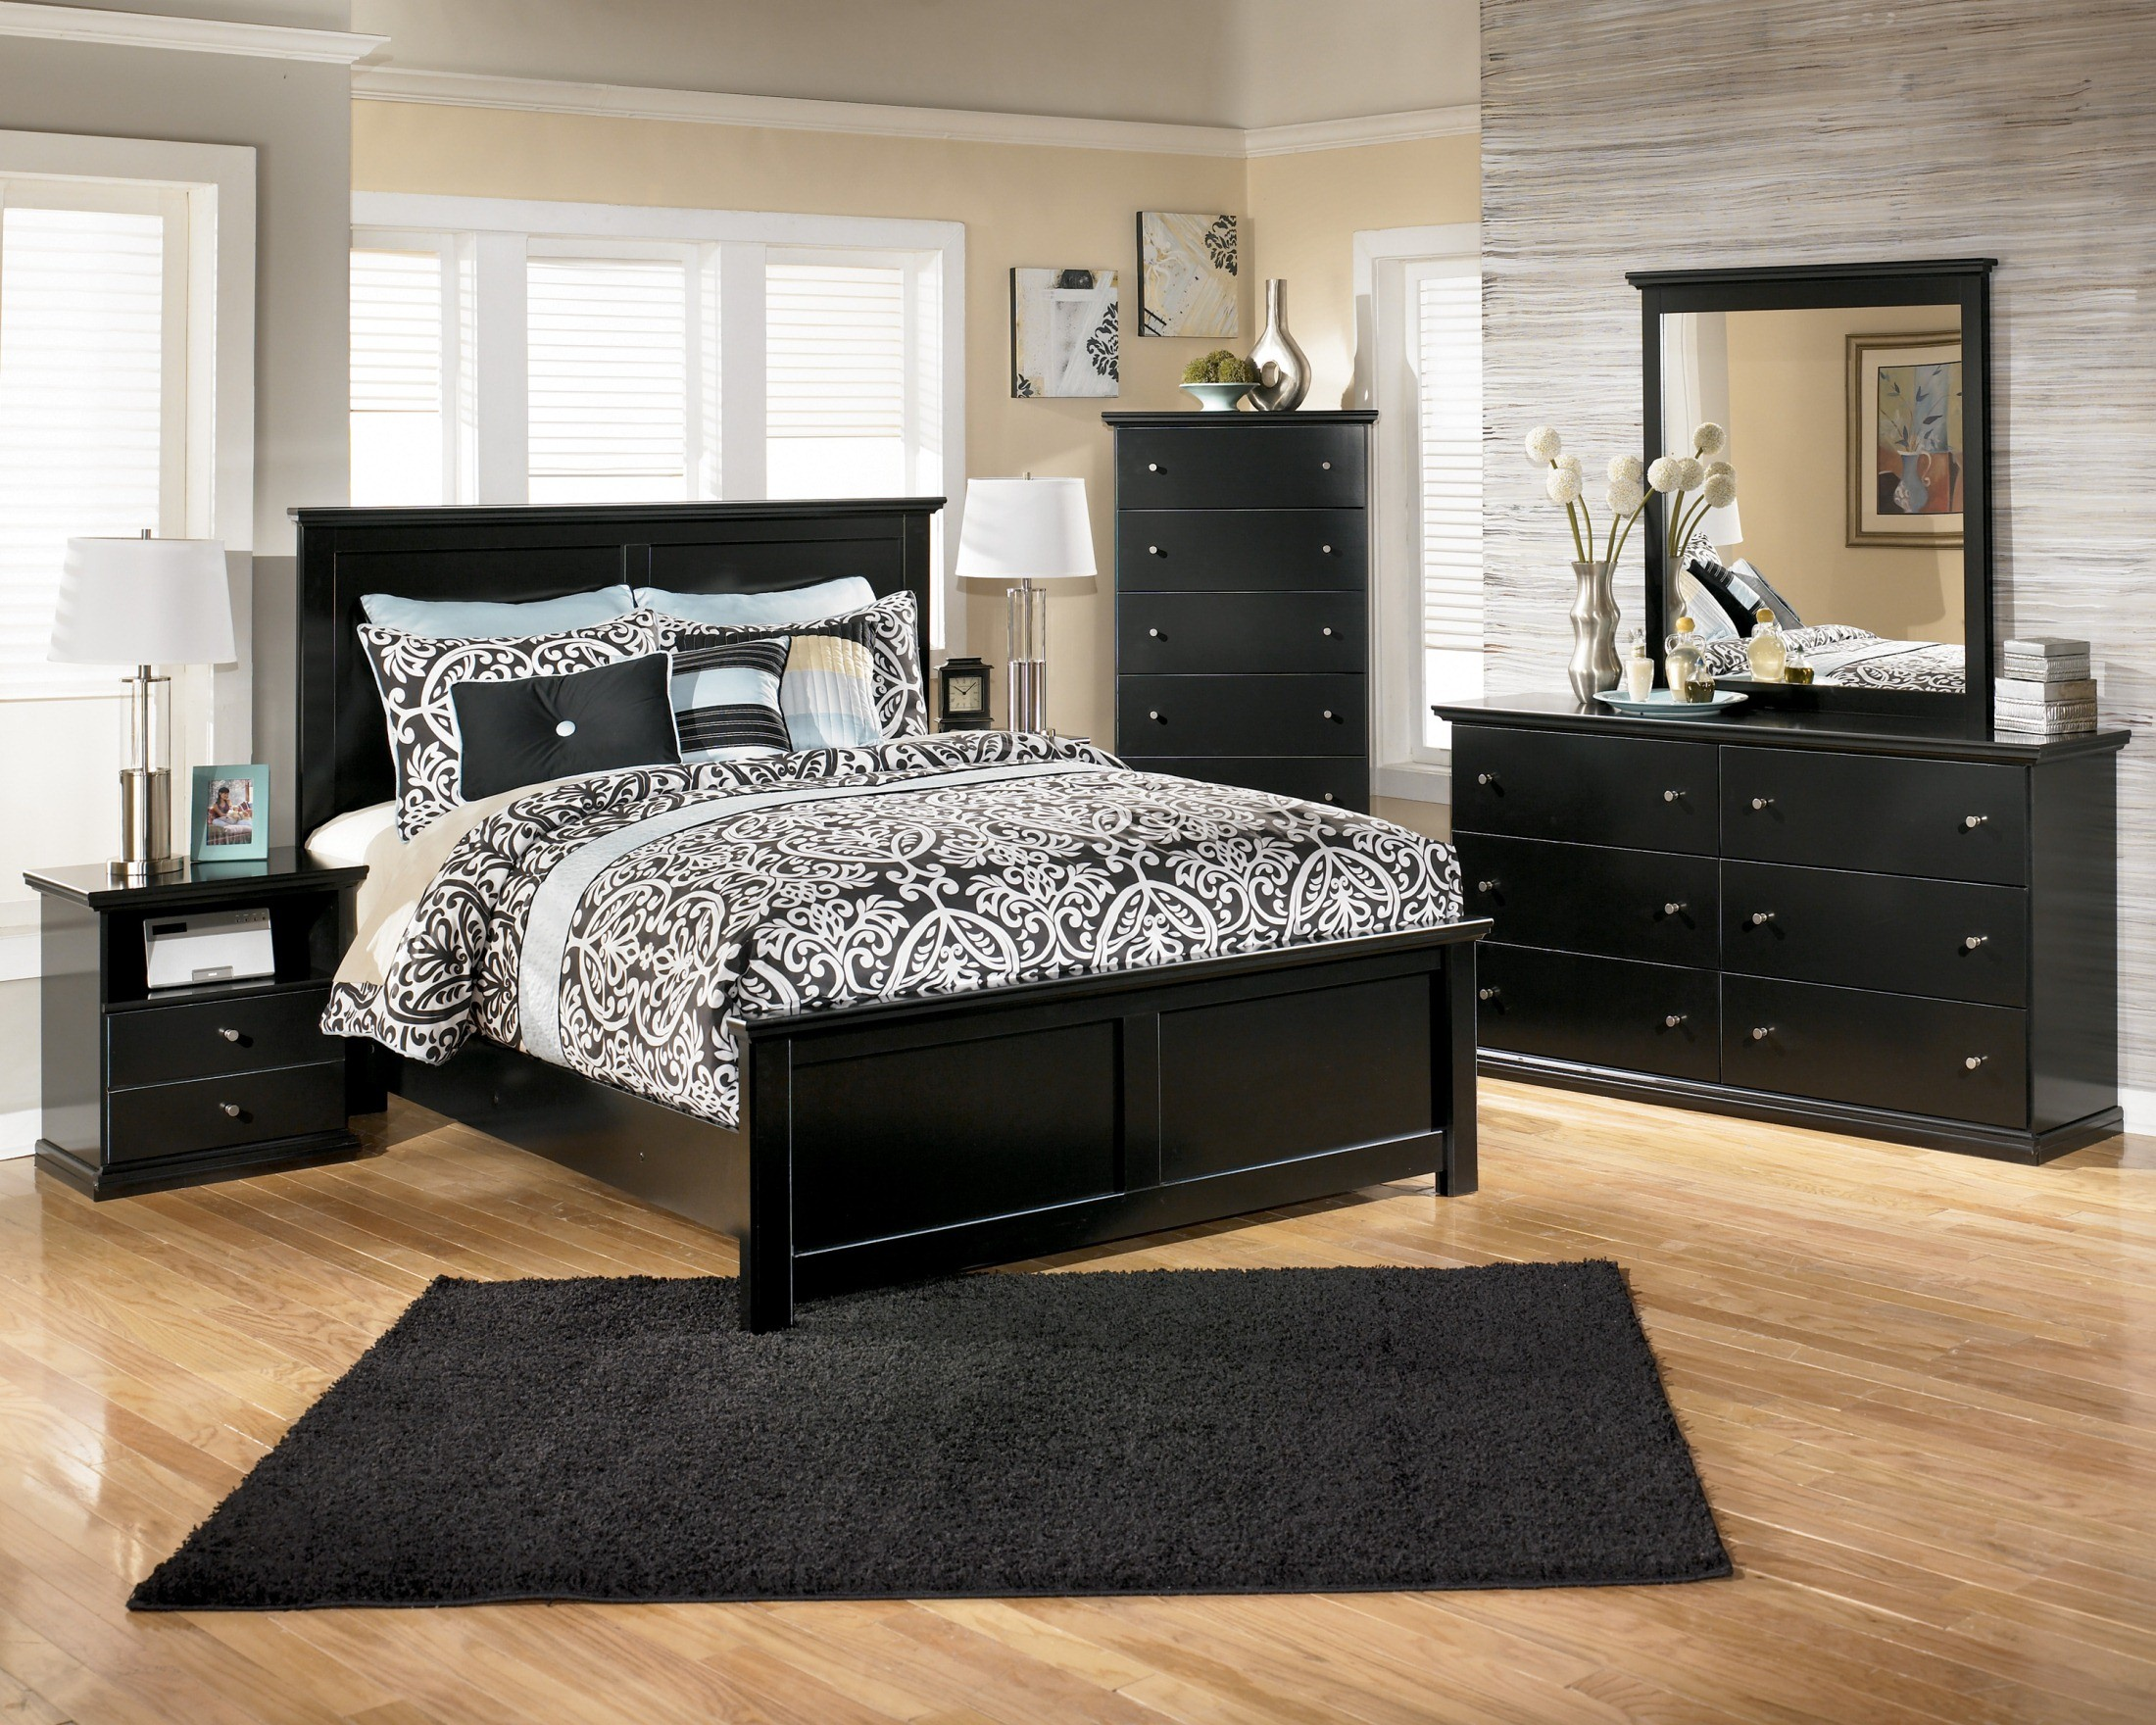 Maribel Bedroom Set From Ashley B Coleman Furniture - Ashley bedroom furniture collections